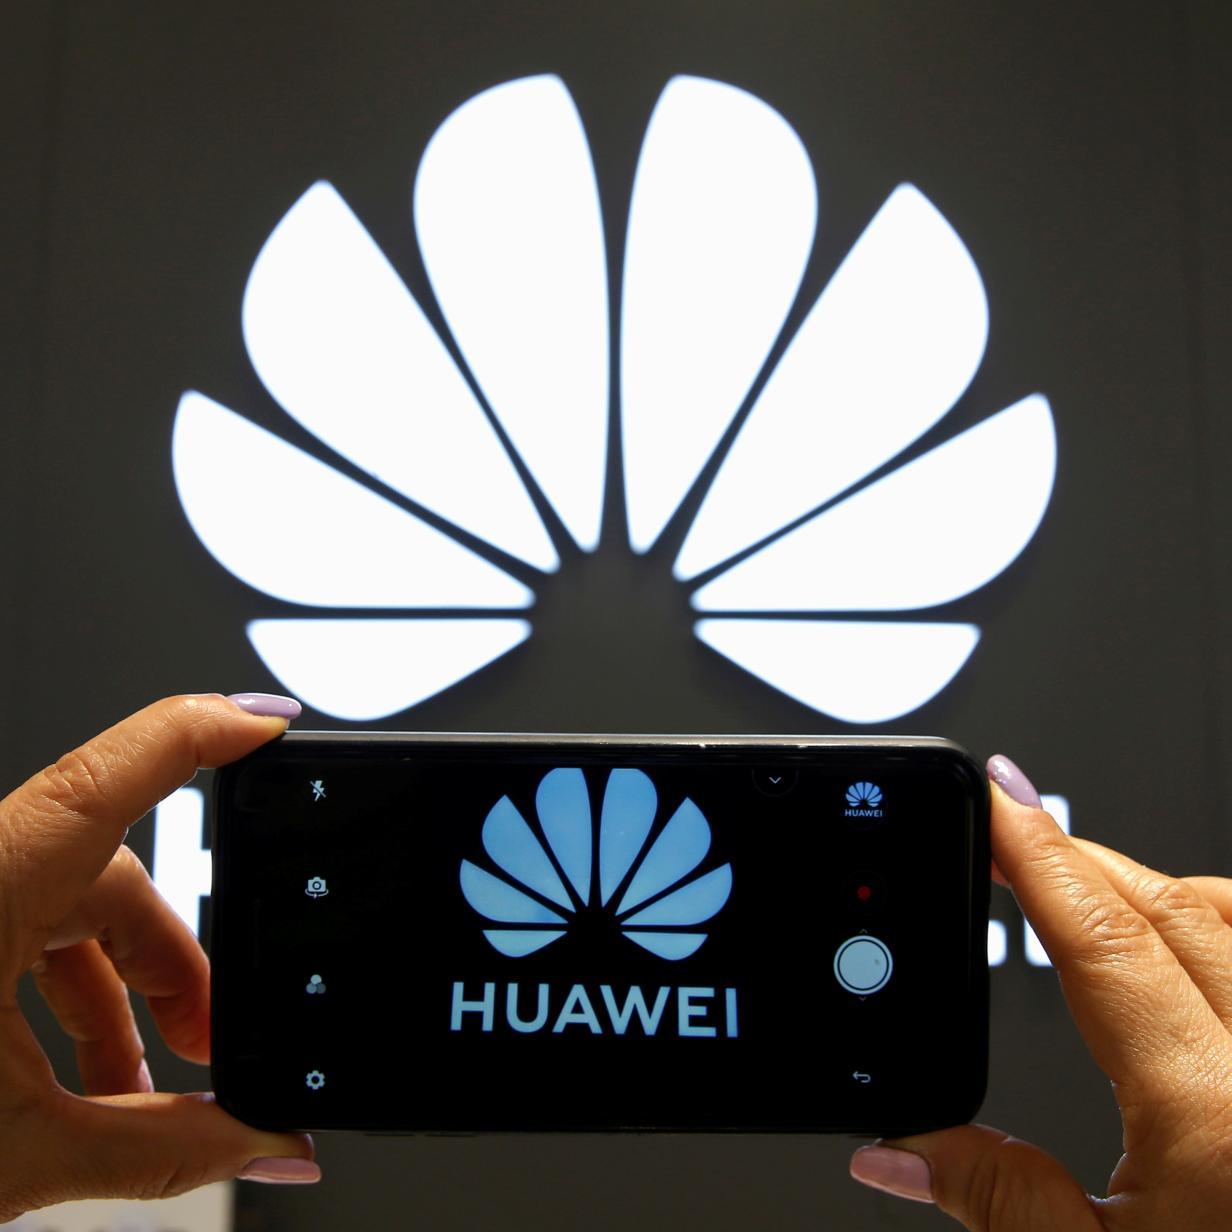 Android-Bann: Huawei bekommt neue Frist gesetzt